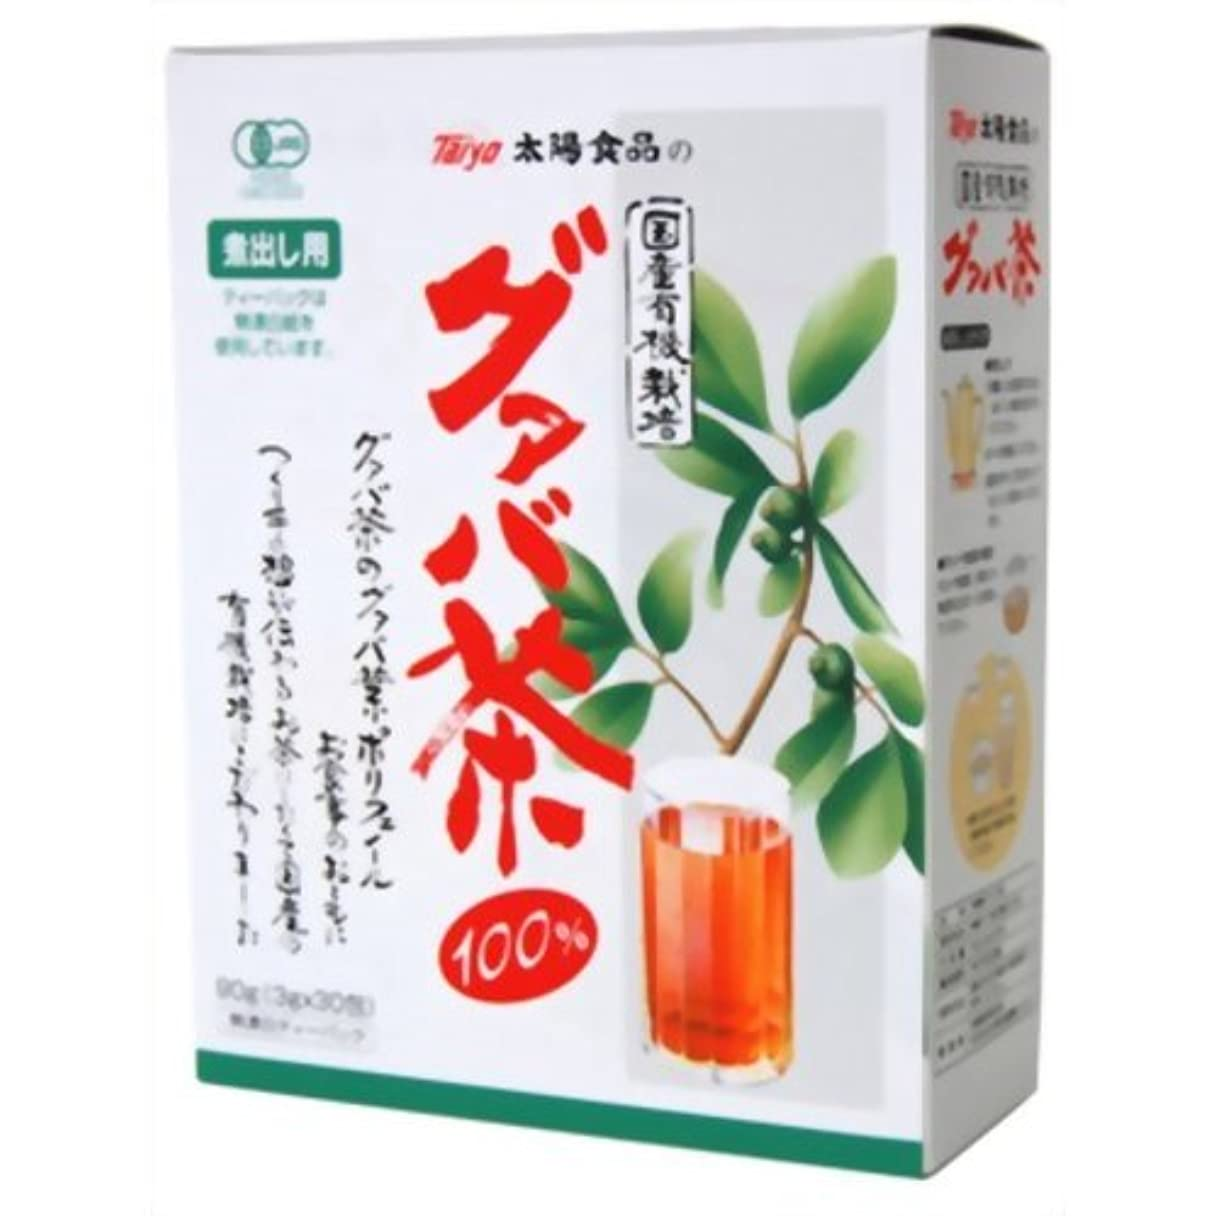 学者消防士フェリー国産有機栽培グアバ茶 3gX30包